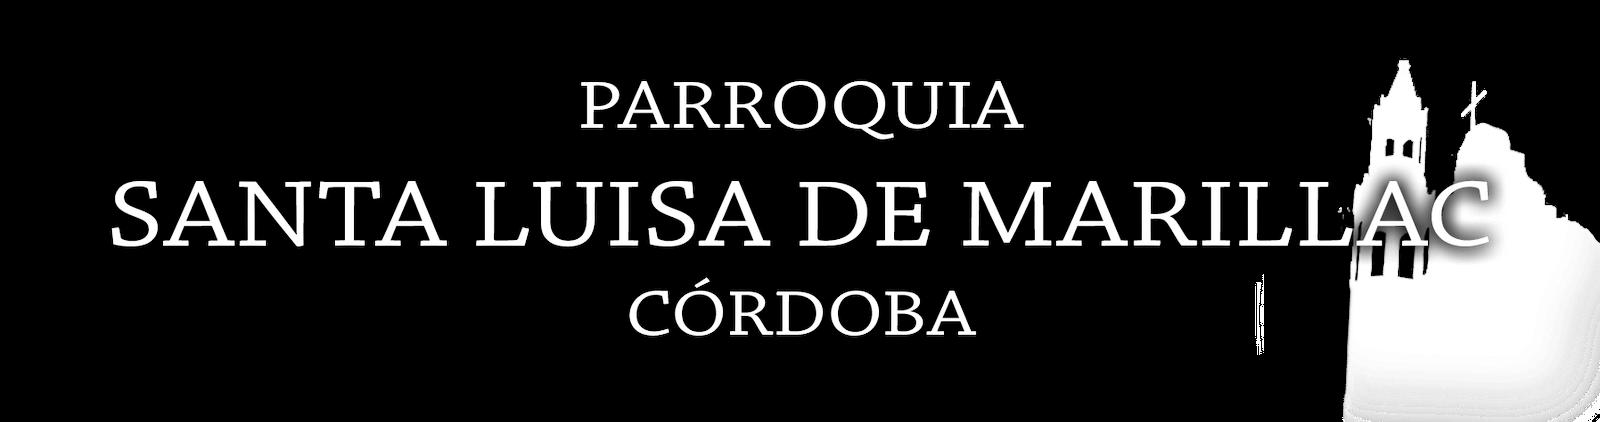 Parroquia Santa Luisa de Marillac                     Córdoba